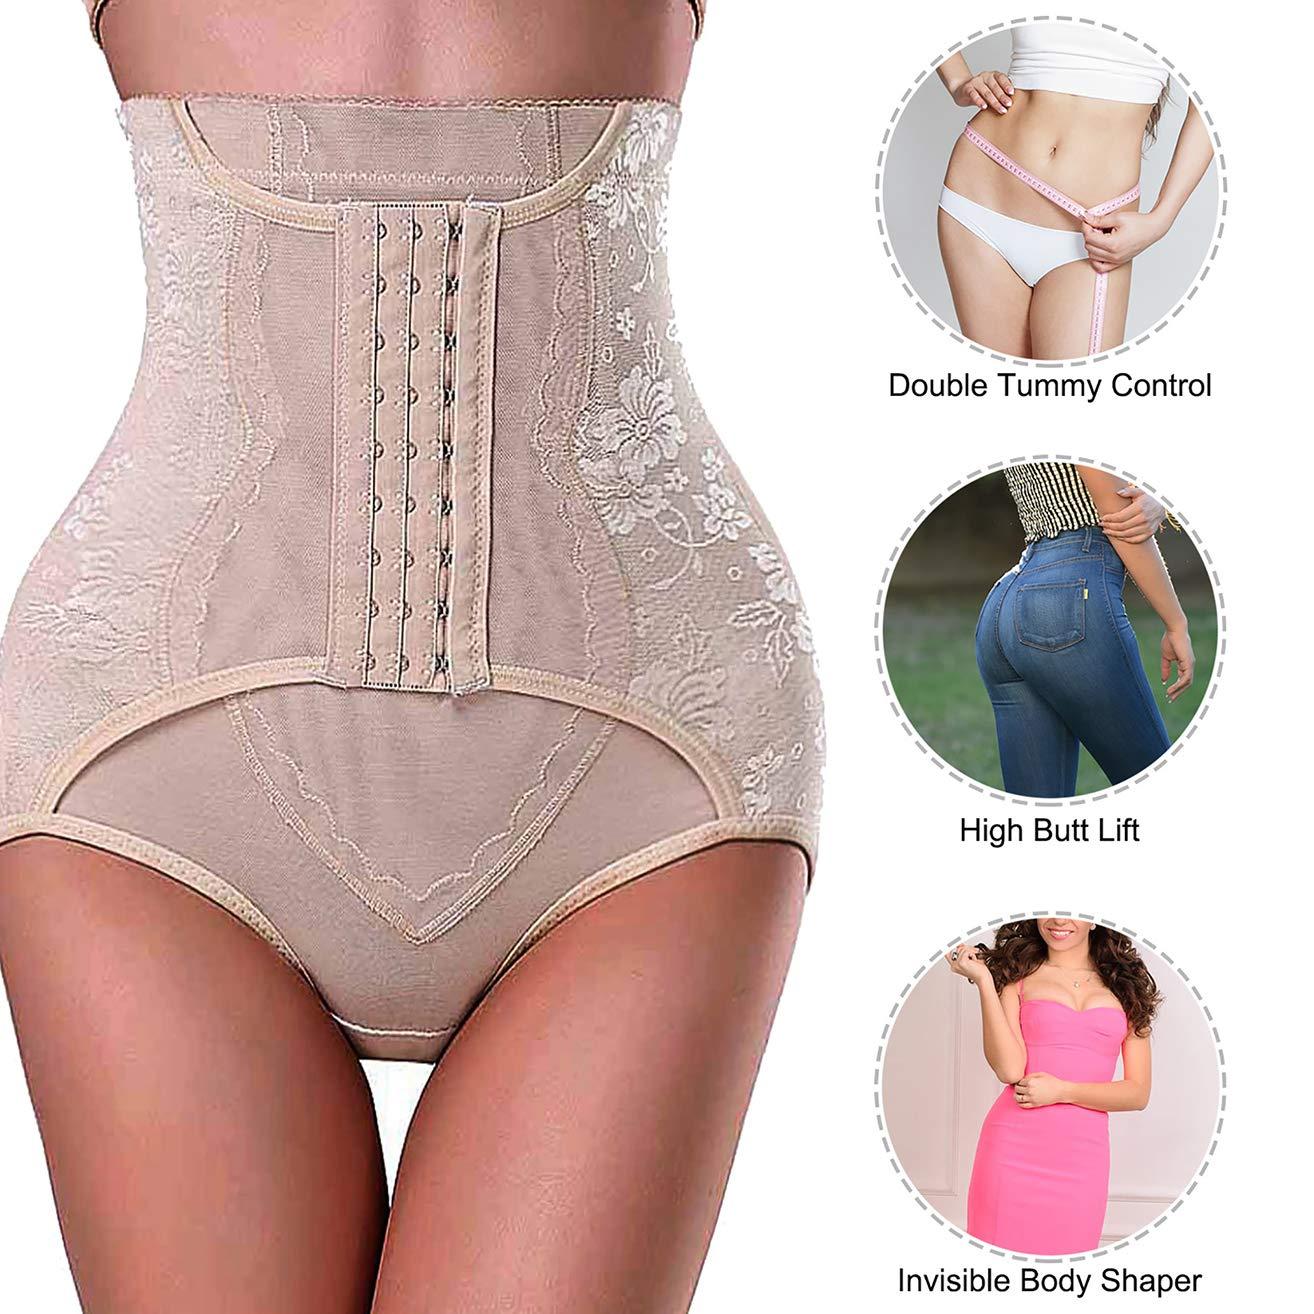 ddee6fce82 Nebility Women Butt Lifter Shapewear Hi-Waist Tummy Control Body Shaper  Shorts Waist Trainer Panty